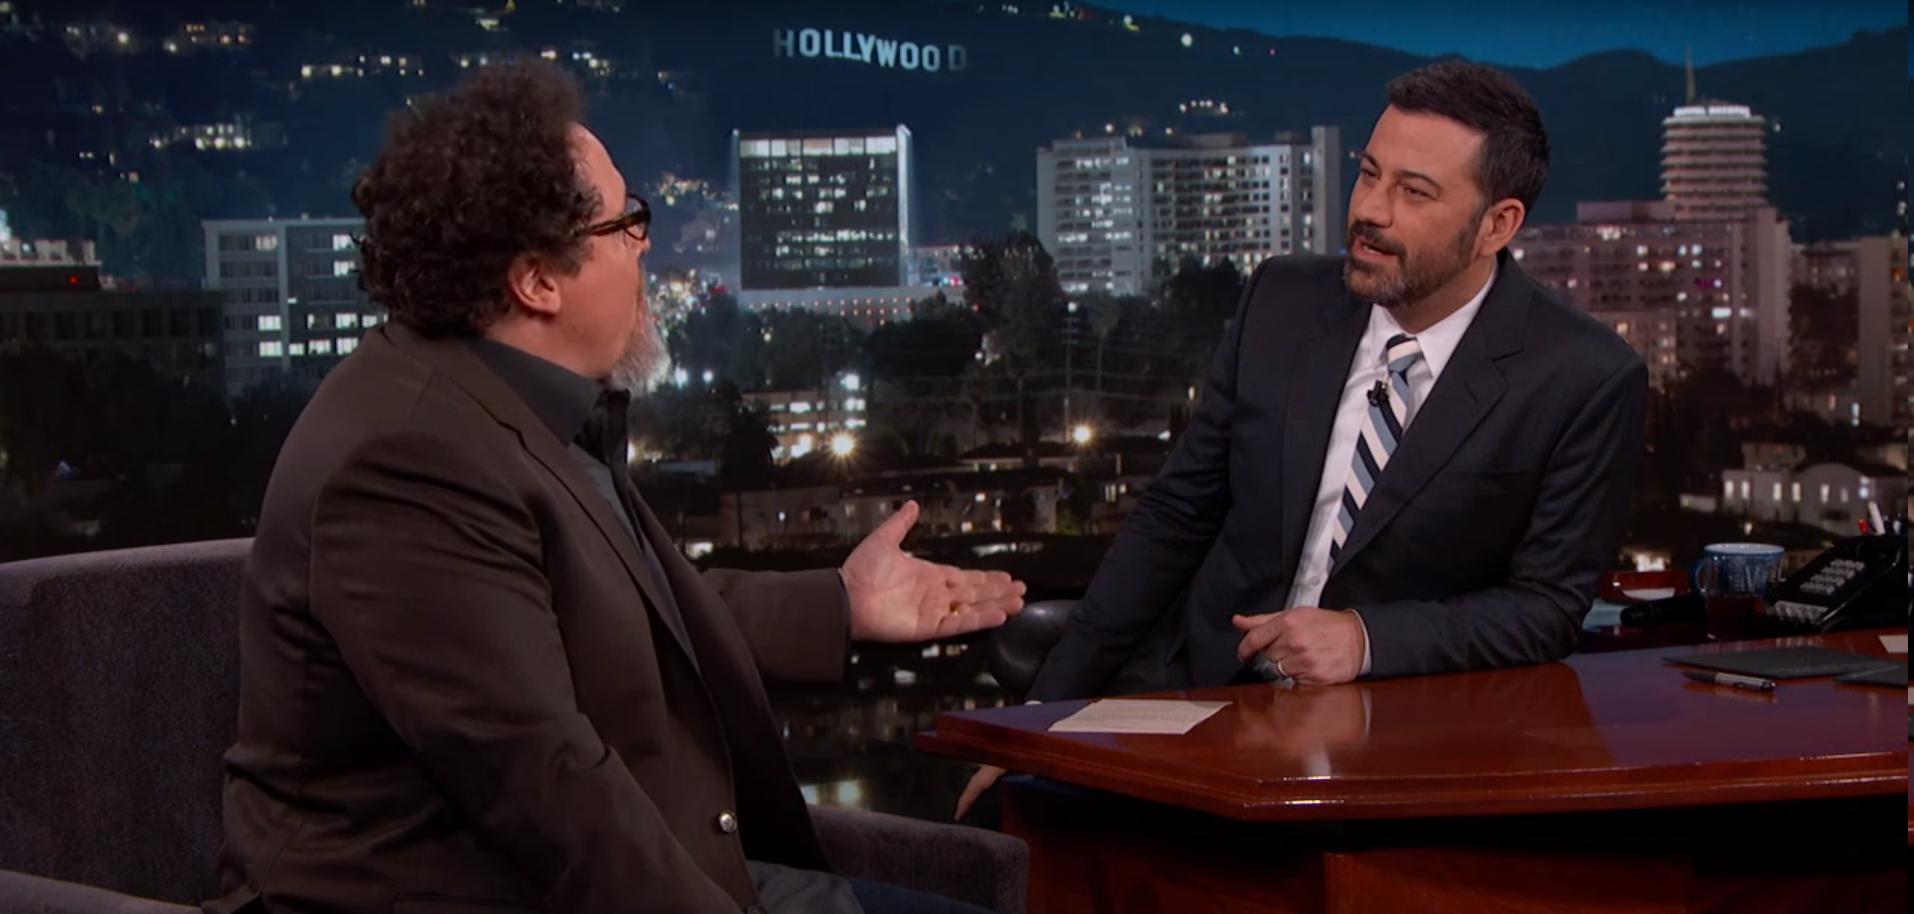 Jimmy Kimmel and Jon Favreau